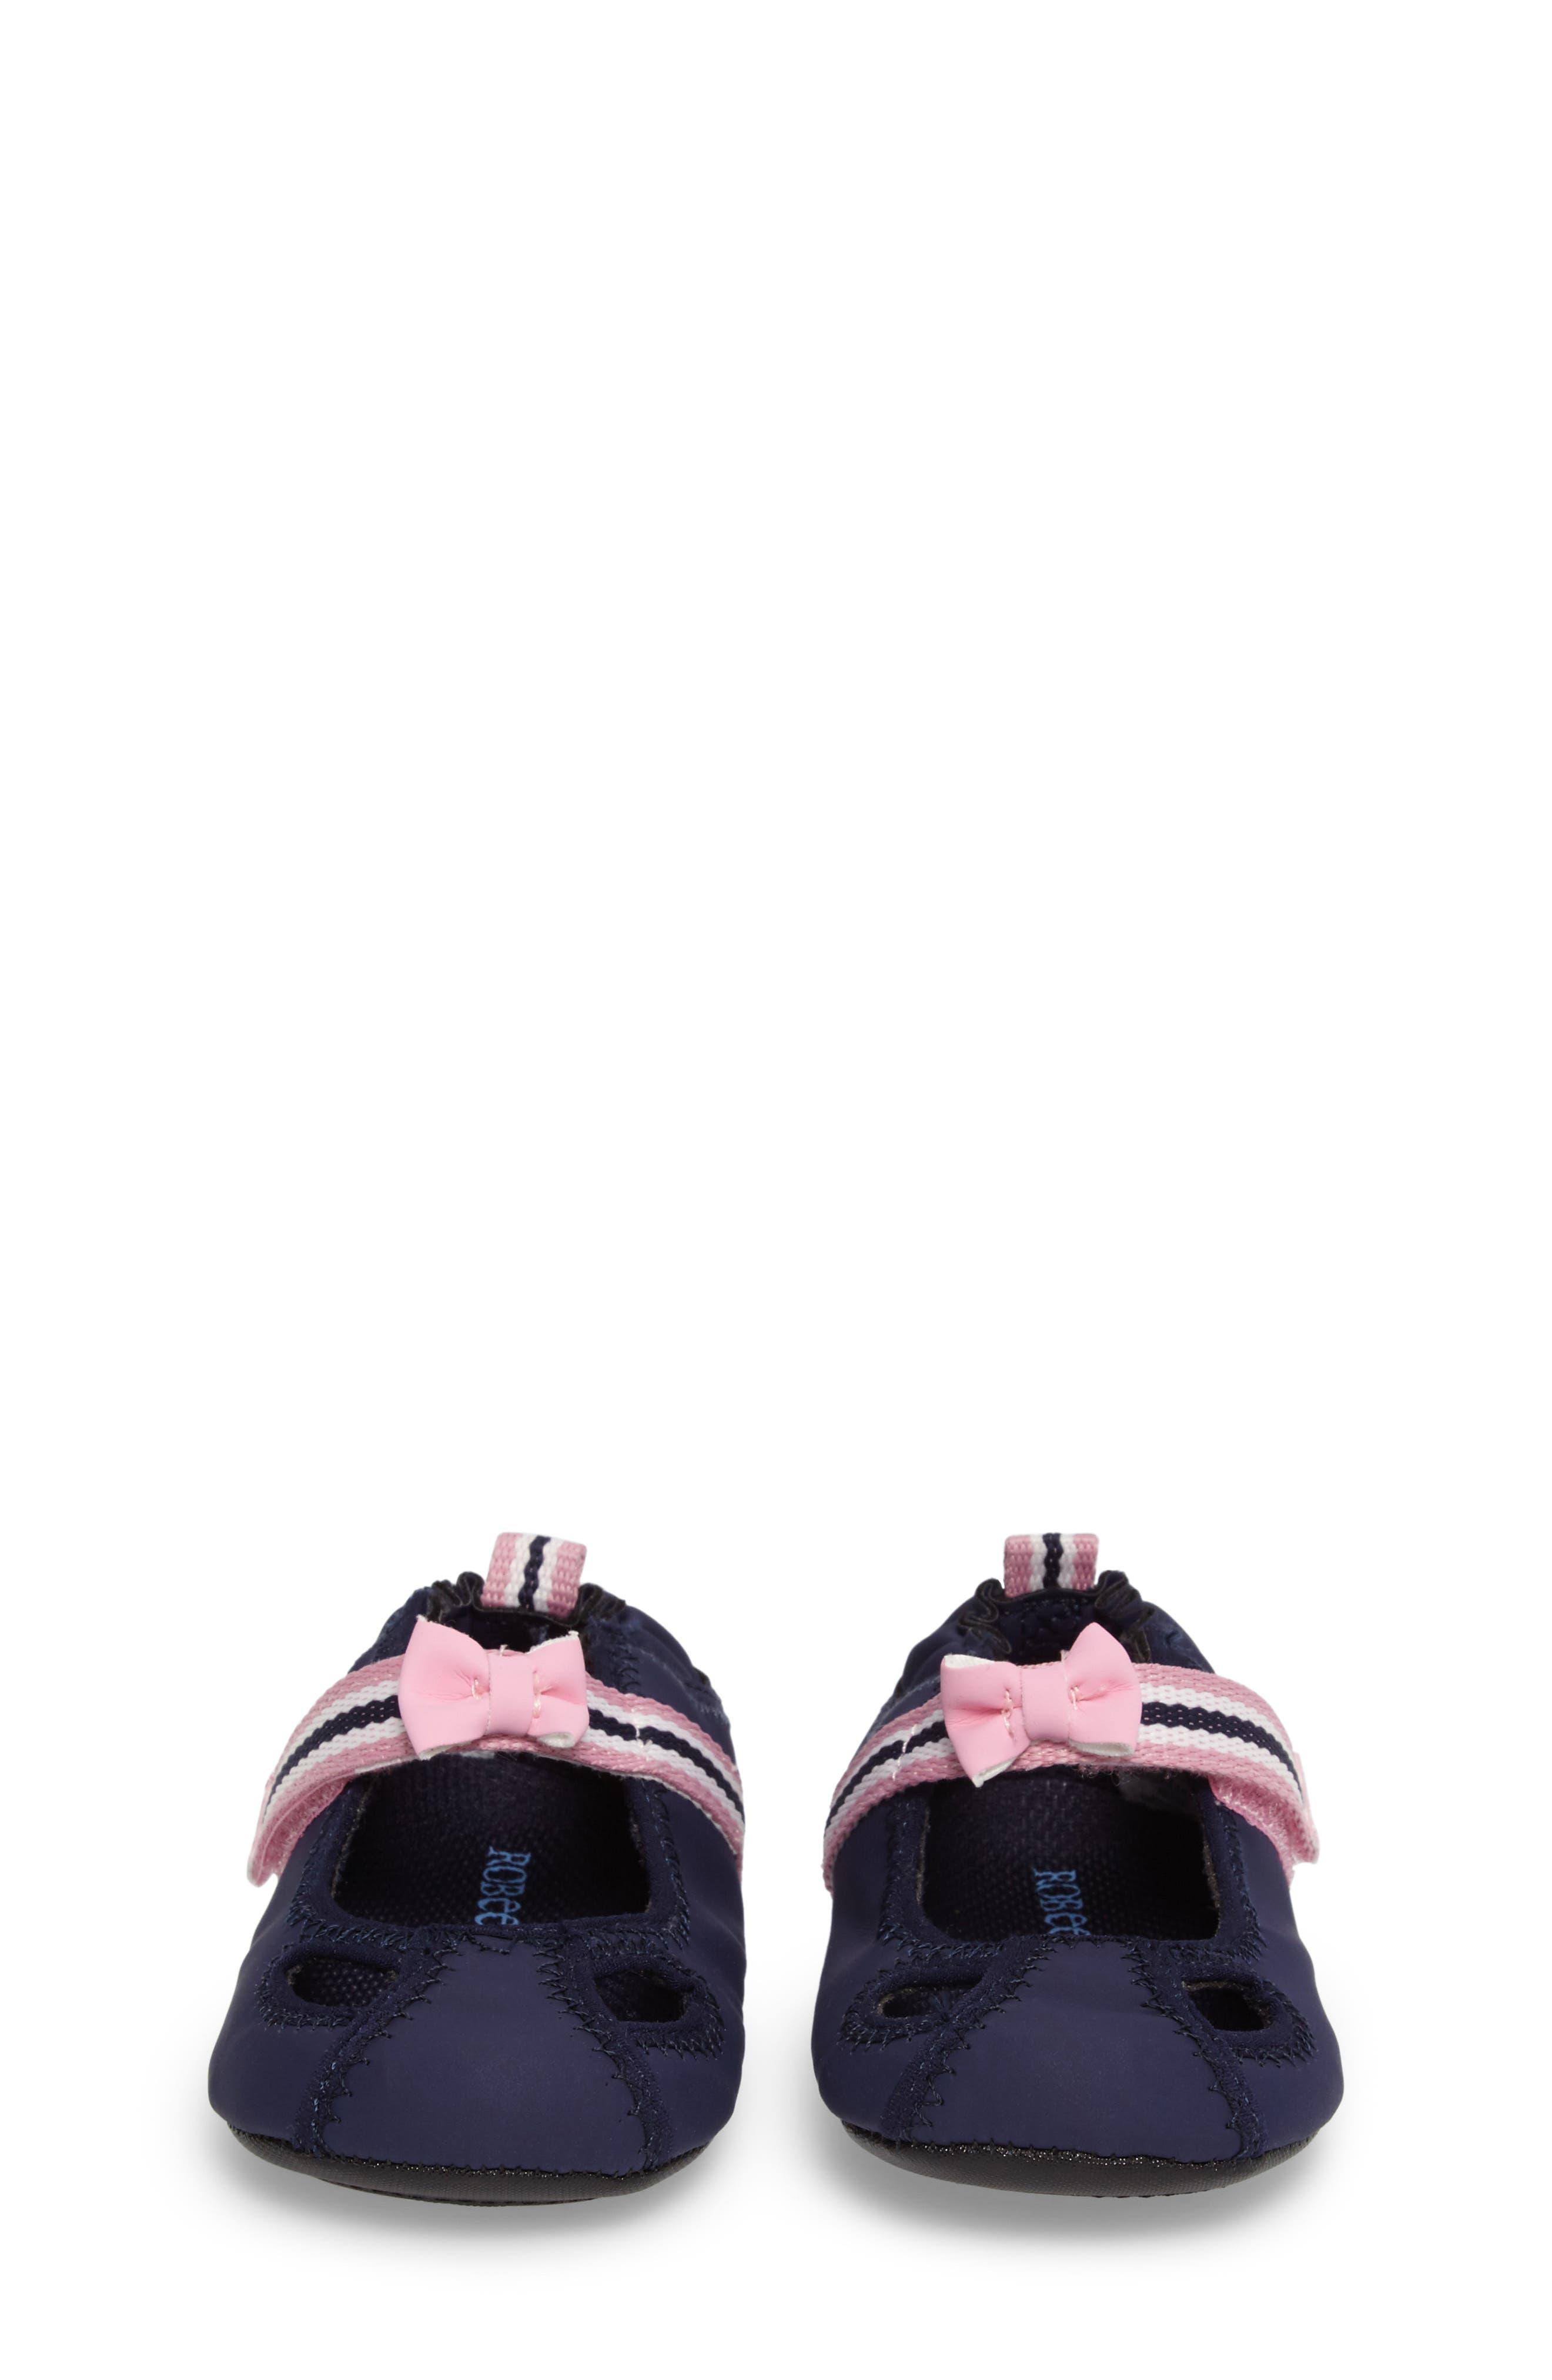 Wave Catcher Crib Shoe,                             Alternate thumbnail 4, color,                             Navy